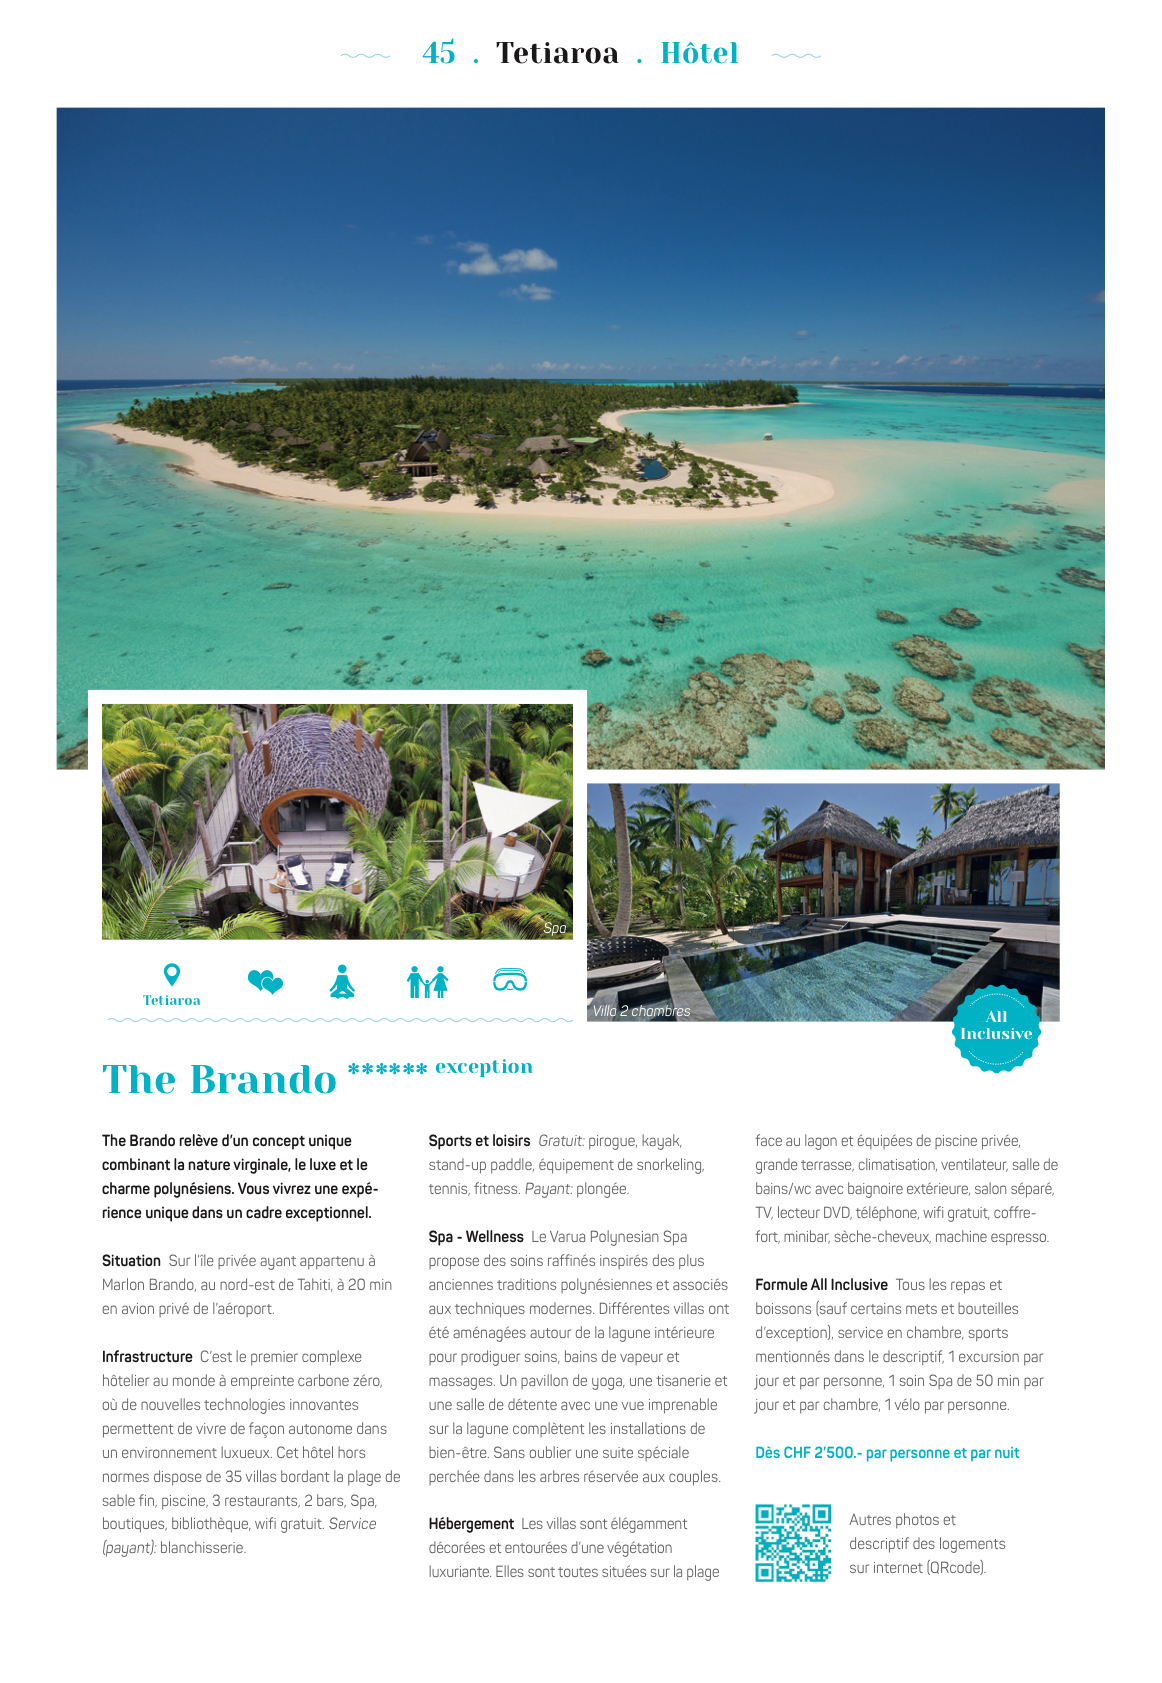 Index Of Webpublication Polynesie Files Mobile # Sous Tv En Boi